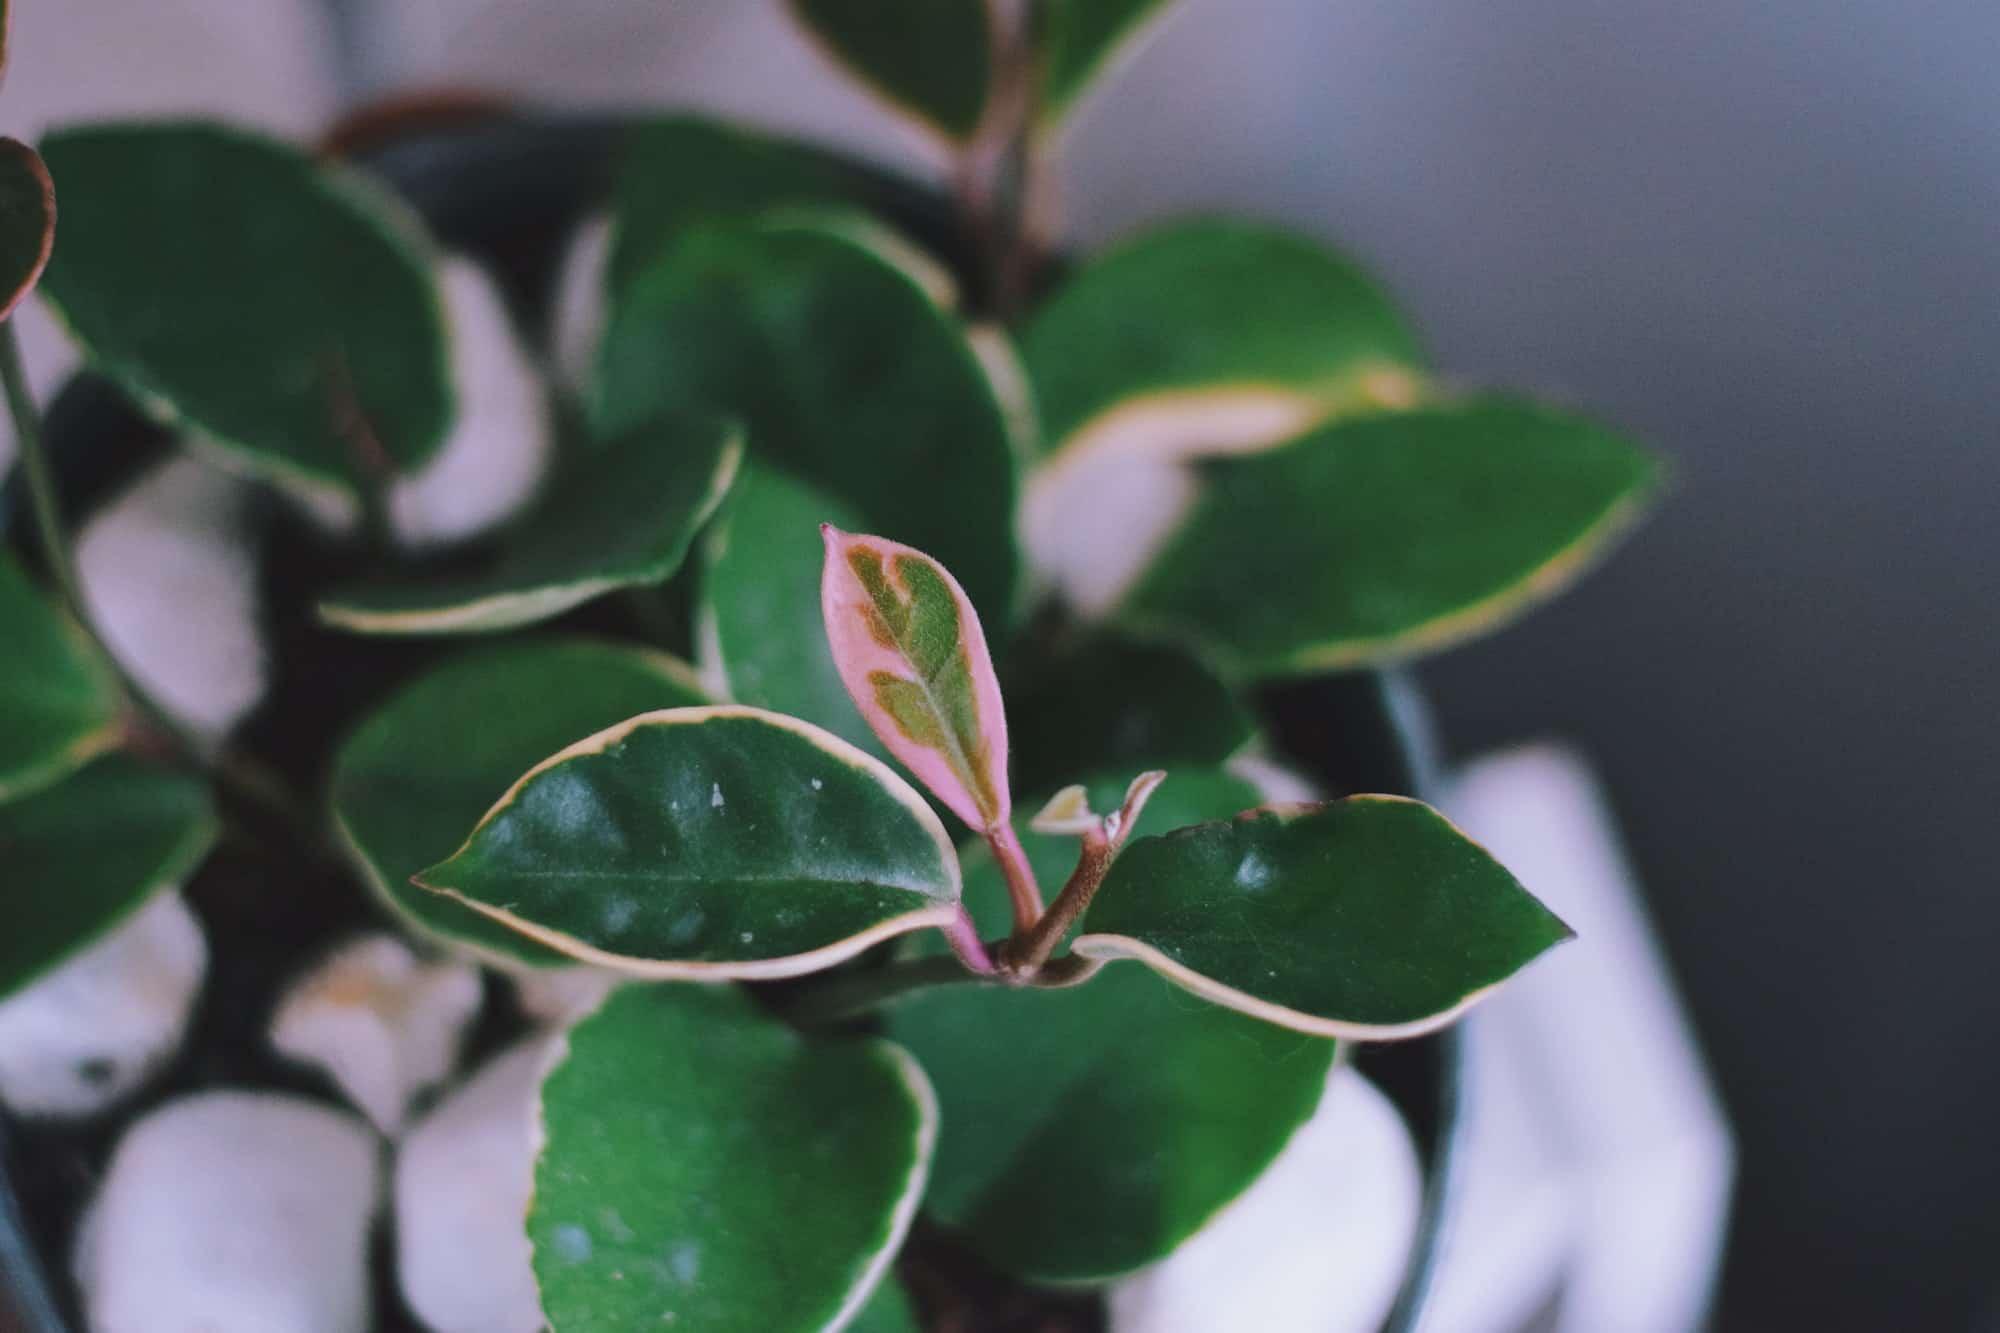 Green Hoya houseplant